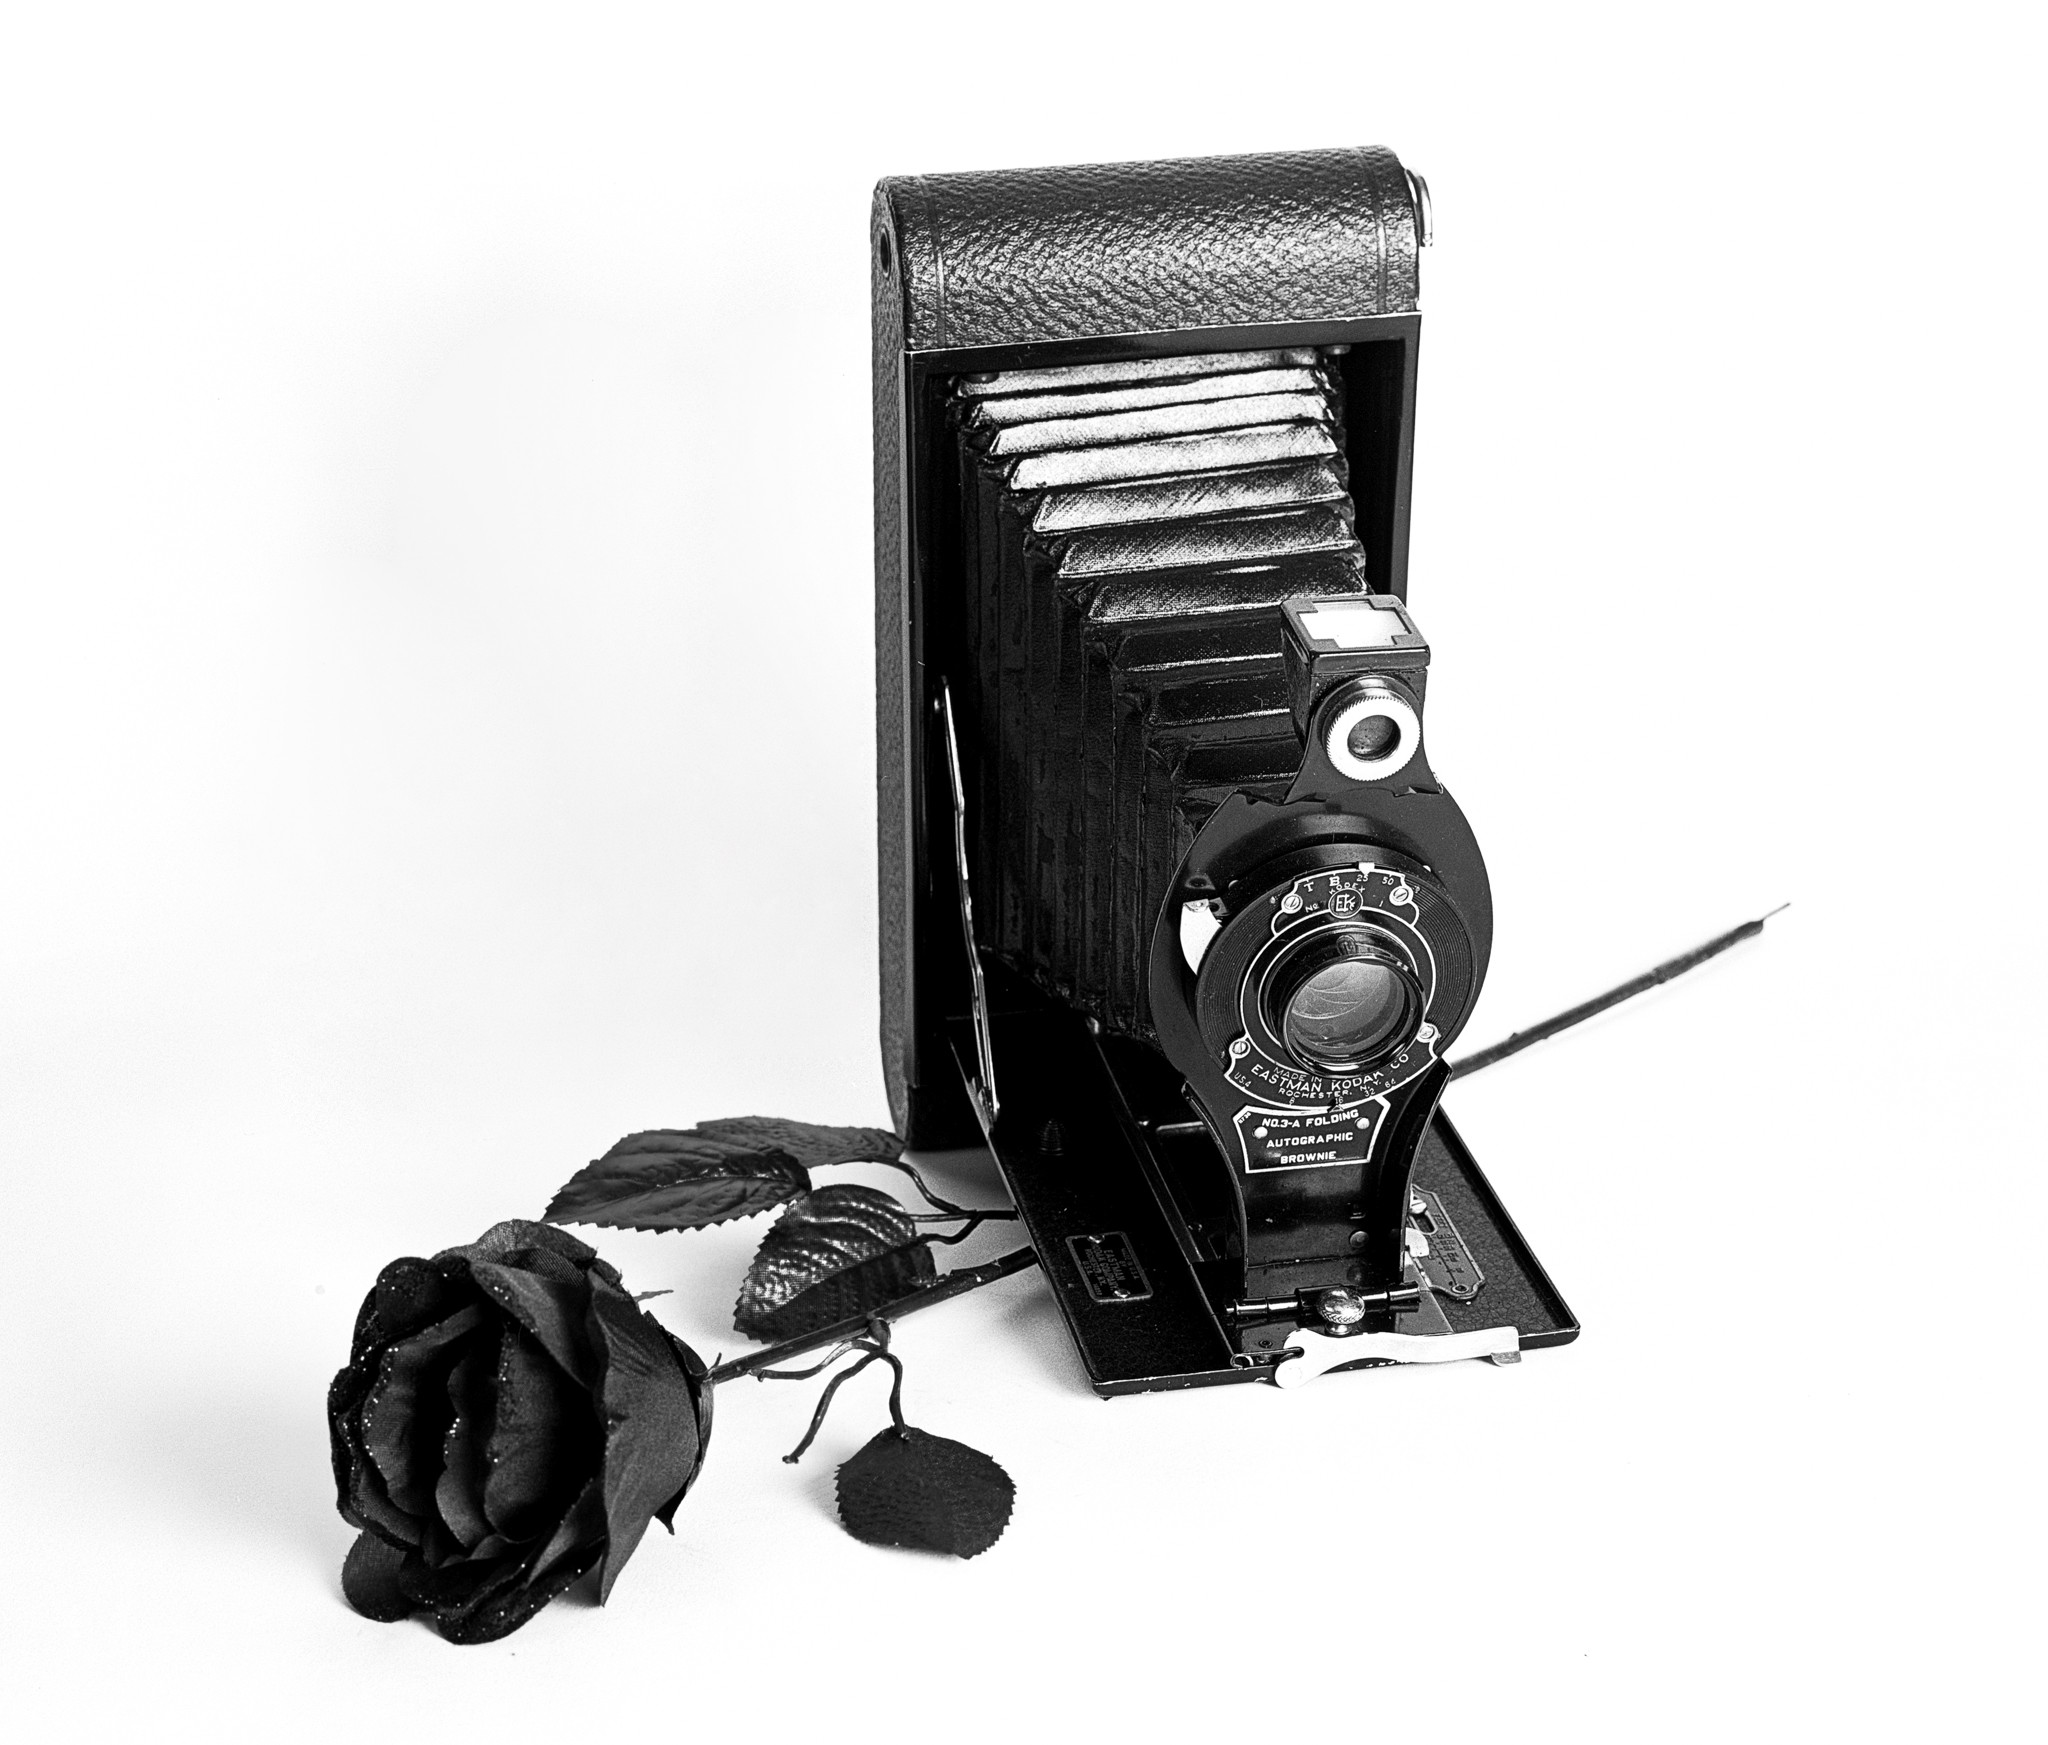 4x5_for_365_project_012_Kodak_3A_Autographic_Brownie_001.jpg